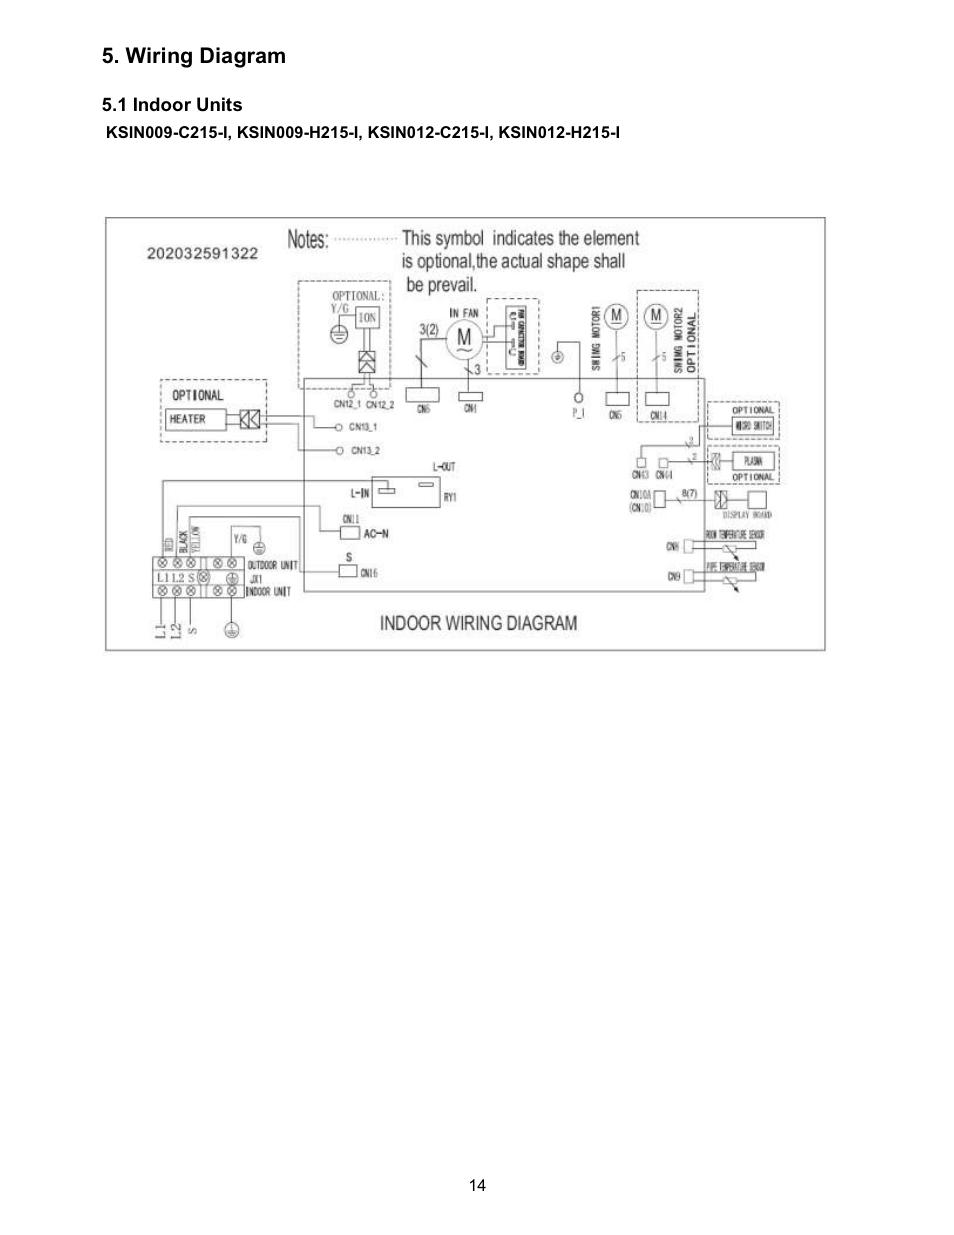 Klimaire Wiring Diagram Free For You 2970 Volkswagen Ksin Series Service Manual User Rh Manualsdir Com Dealers